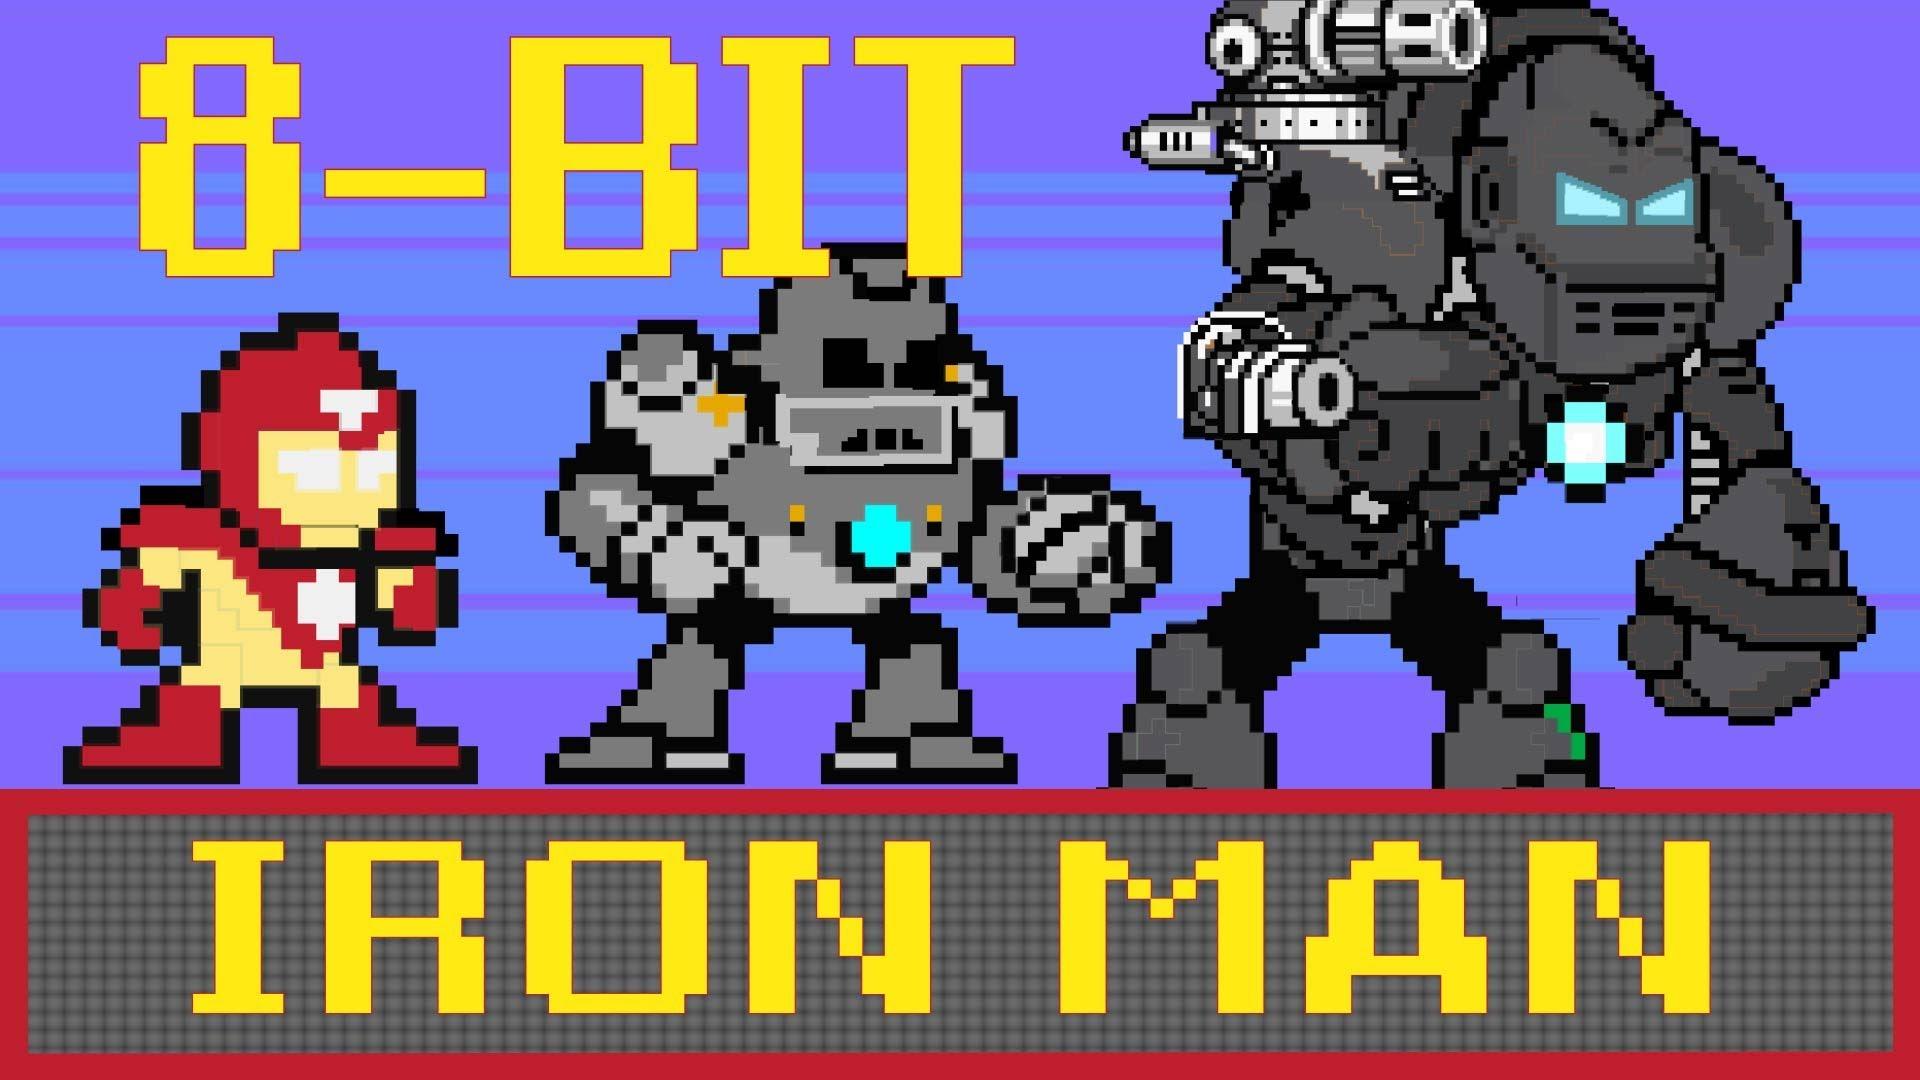 8-Bit Cinema: Iron Man Retold in 60 Animated Seconds